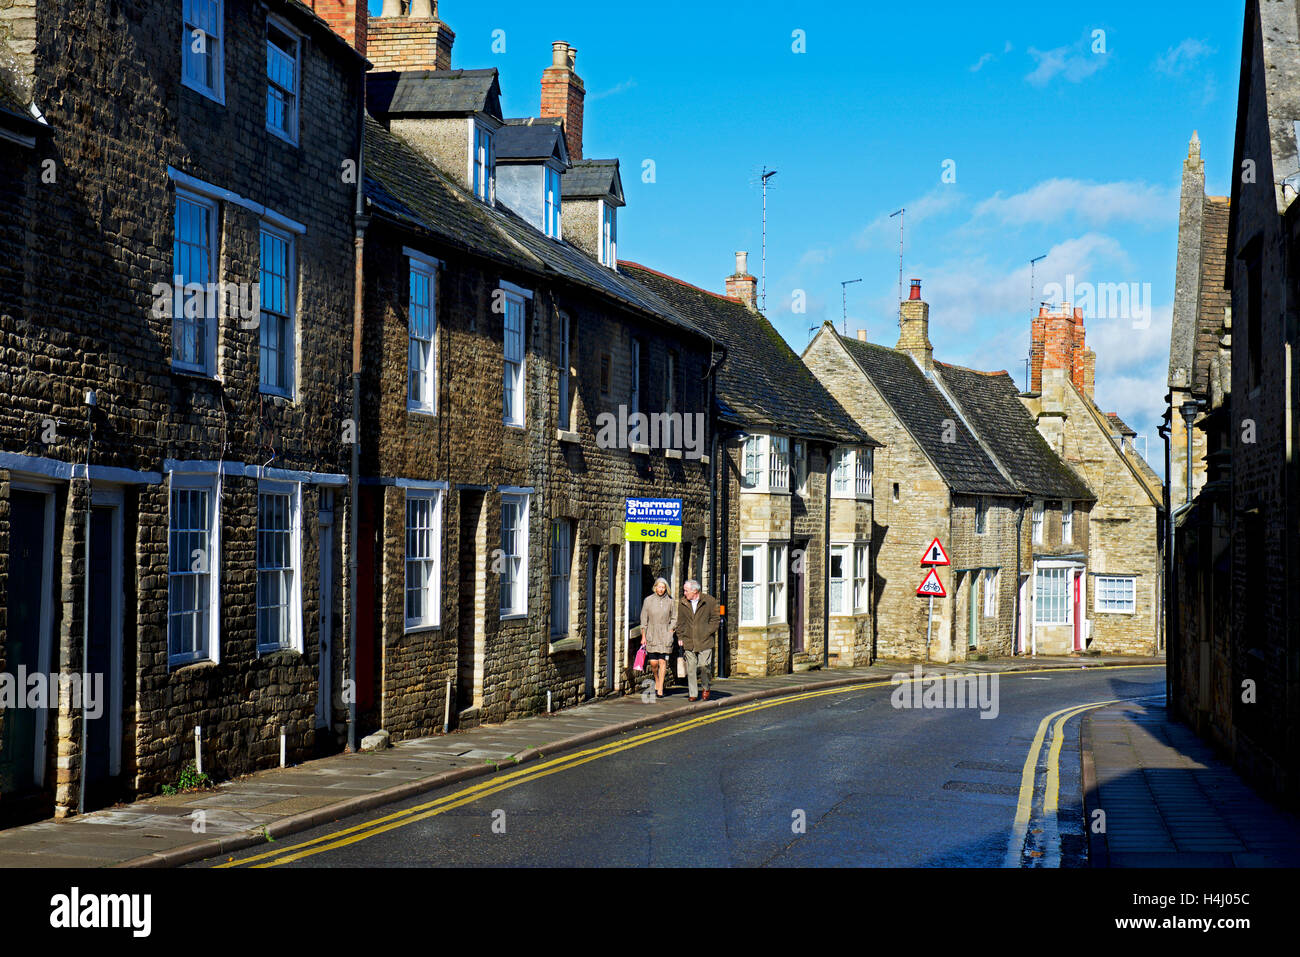 Oundle, Northamptonshire, England UK - Stock Image